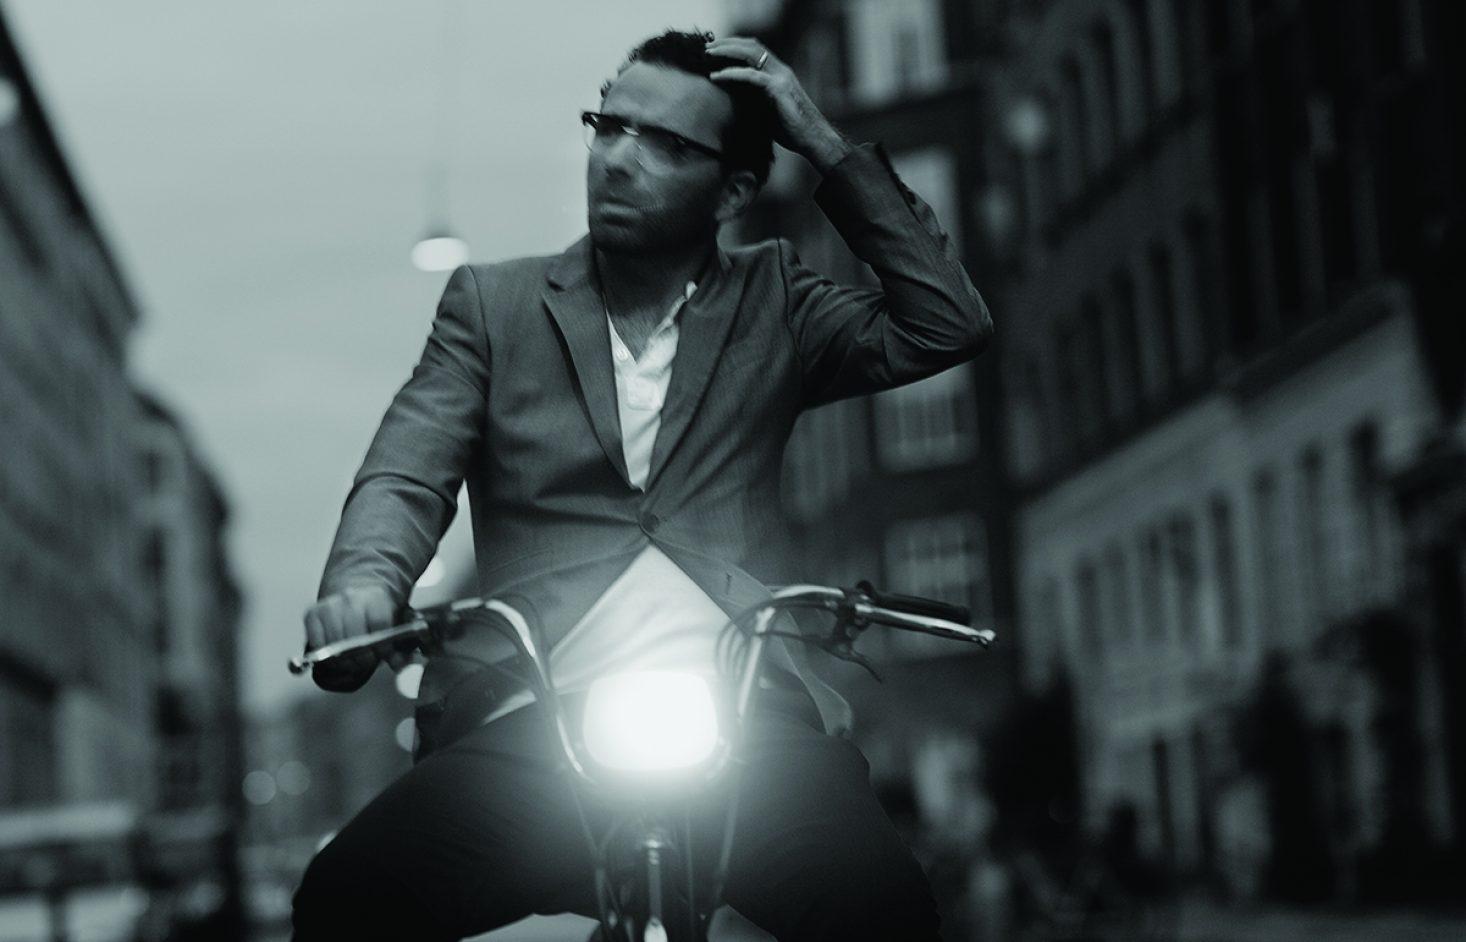 Se de seneste nye offentliggørelser til Copenhagen Jazz Festival 2021